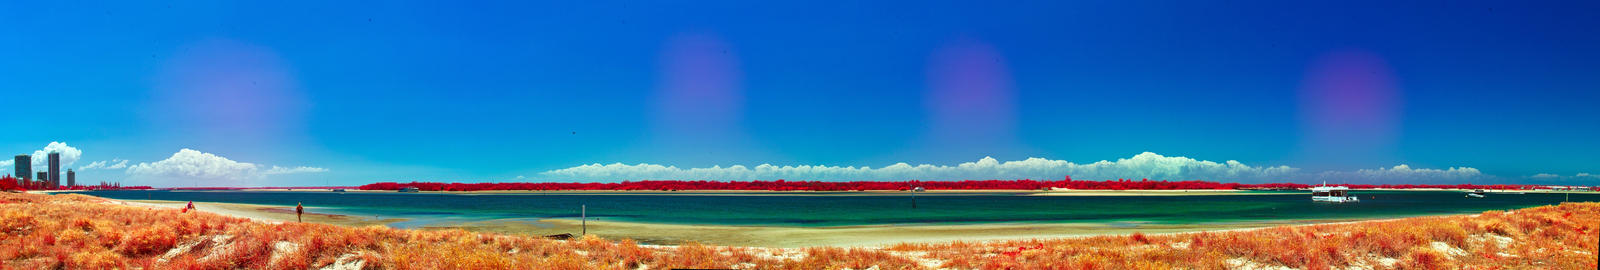 Broadwater, Gold Coast, QLD, Australia by colinbm1